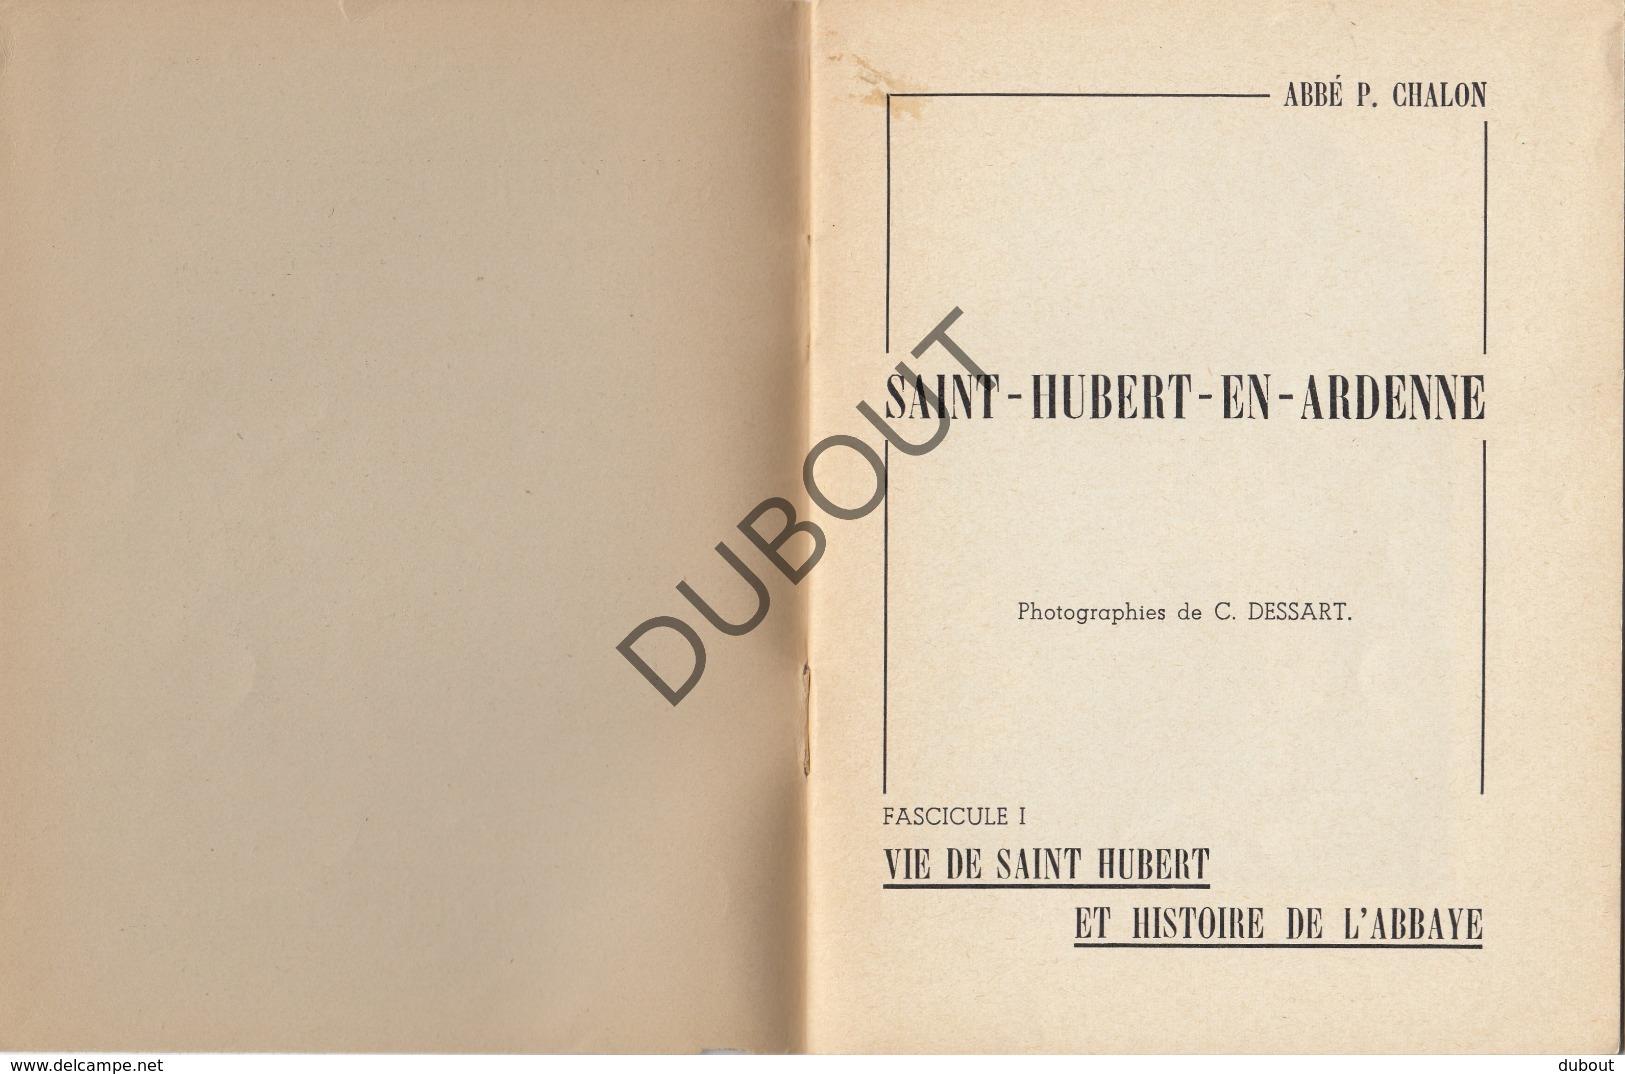 SAINT HUBERT EN ARDENNE - P. Chalon - Vie De St-Hubert 1950 Avec Des Illustrations (R336) - Boeken, Tijdschriften, Stripverhalen